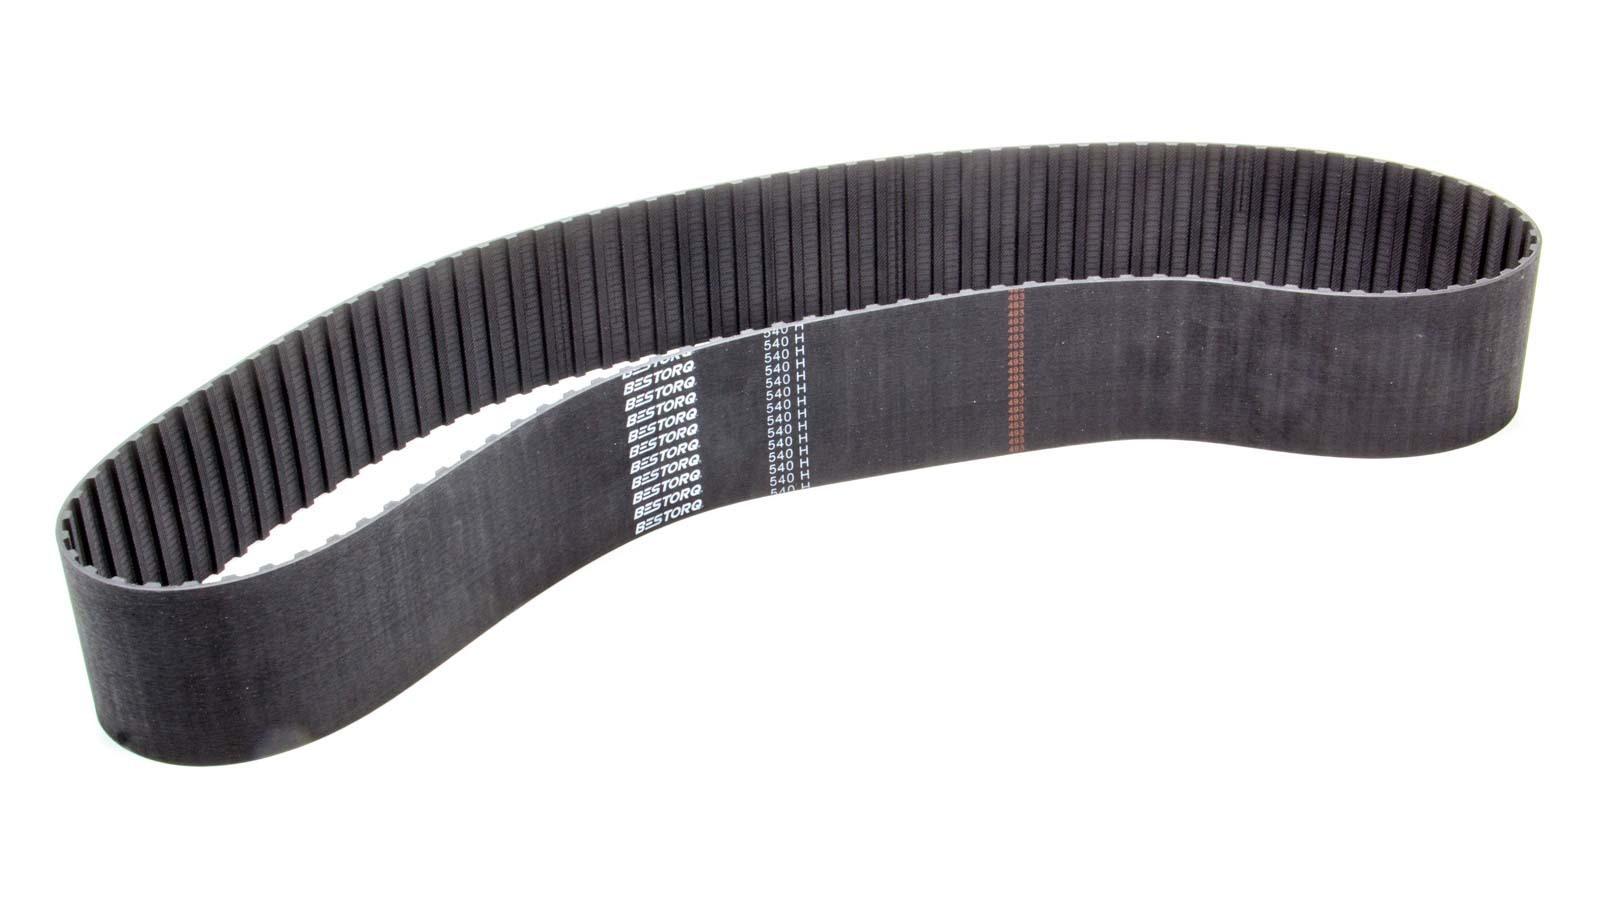 Blower Drive Service Blower Belt - 57 x 3 - 1/2 Pitch